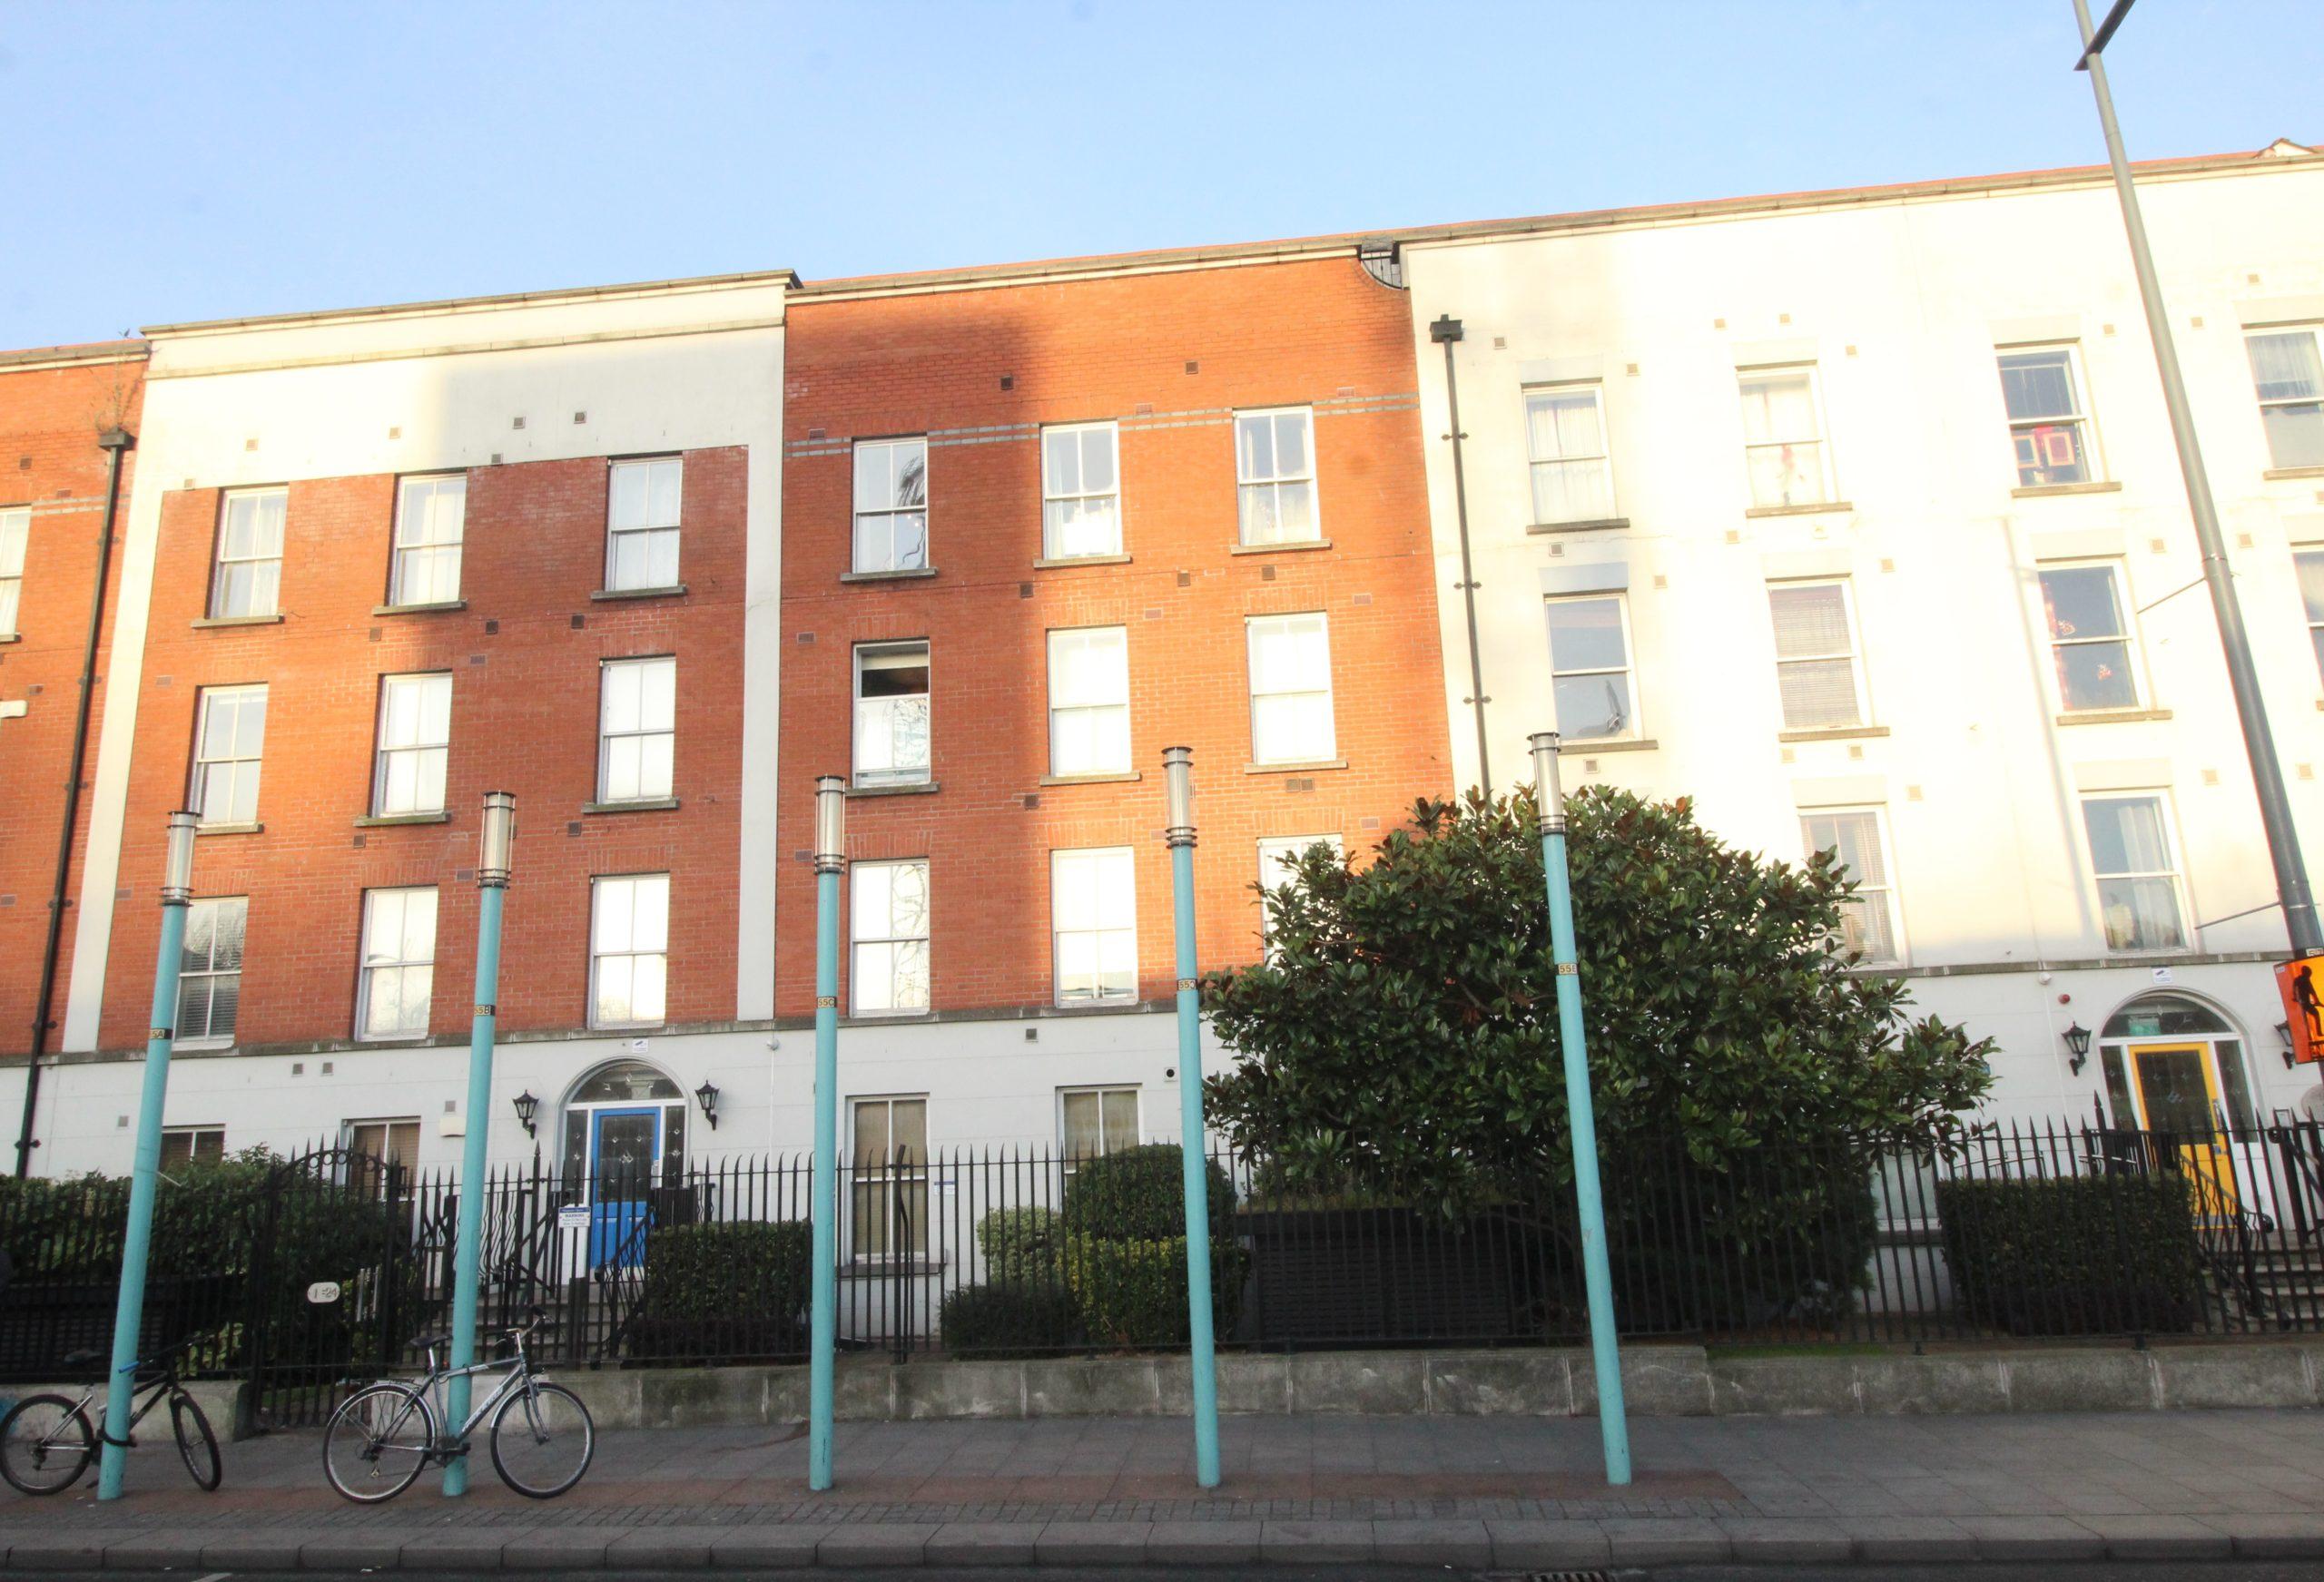 16 Derrynane Square, Dorset Street, Dublin 1, D07WD1V